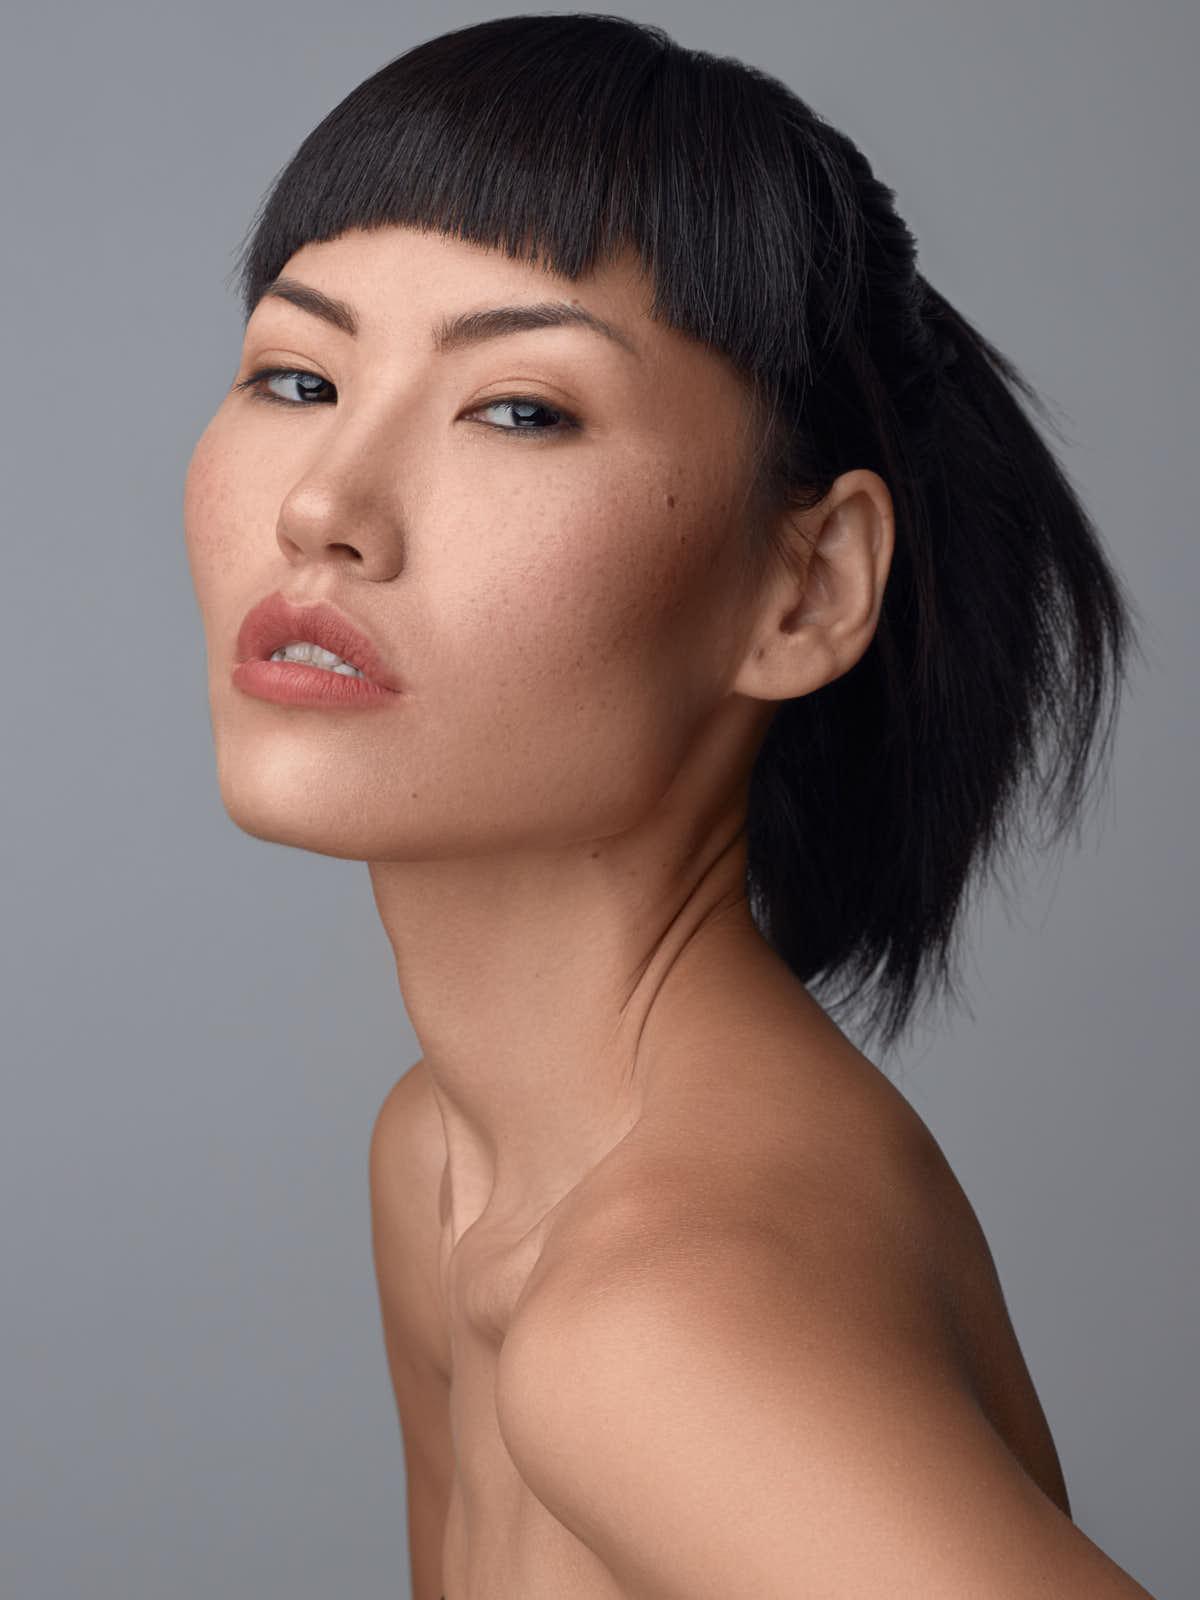 sce-agency-female-model-tia-b-1aaa